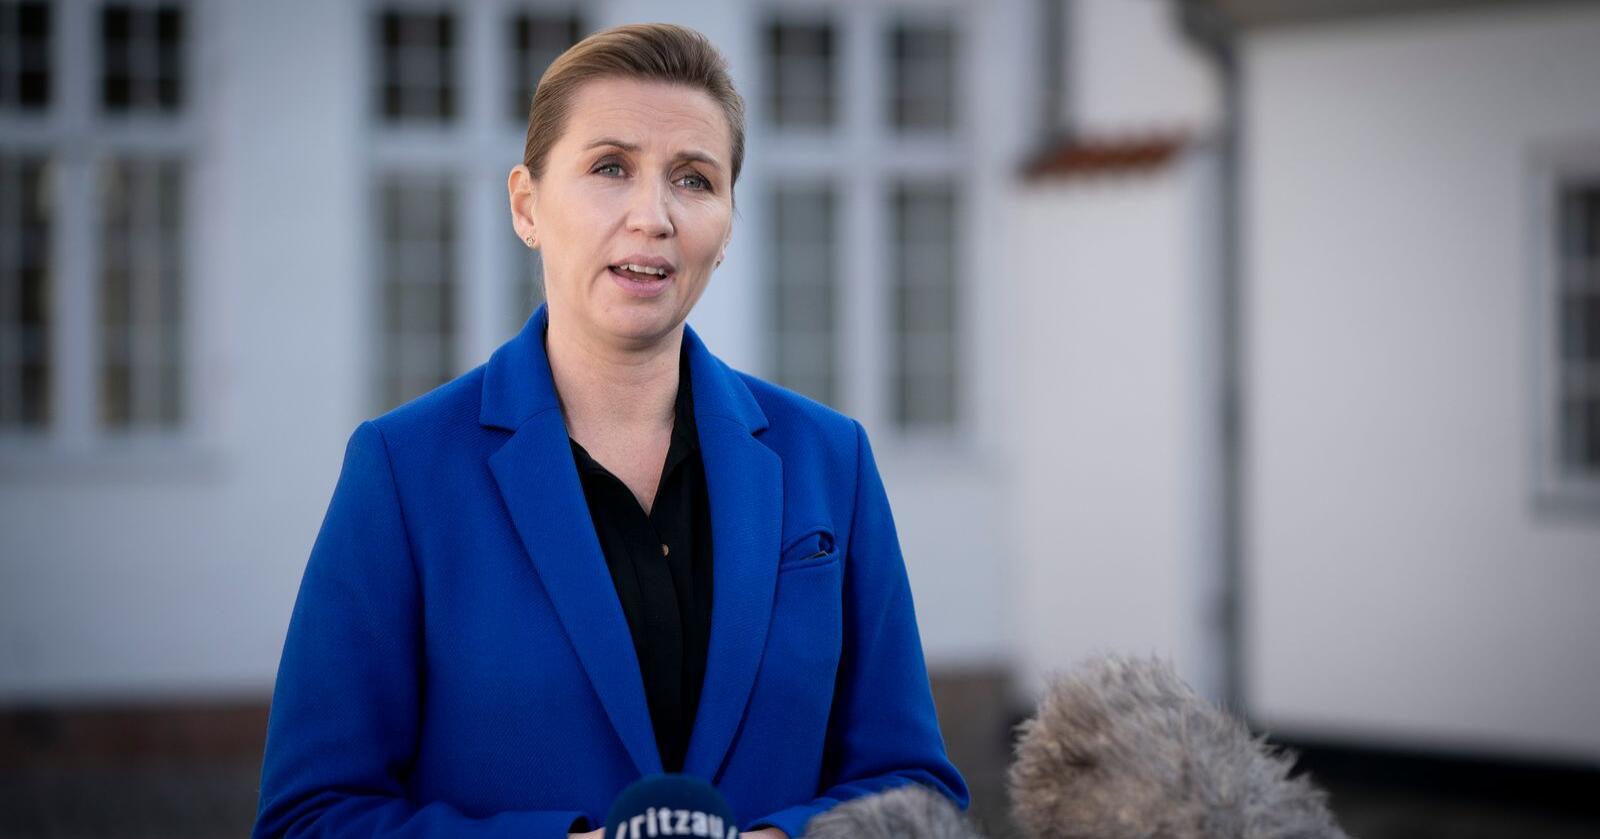 Danmarks statsminister Mette Frederiksen på en pressekonferanse tidligere i november. Foto: Liselotte Sabroe / Ritzau Scanpix via AP / NTB